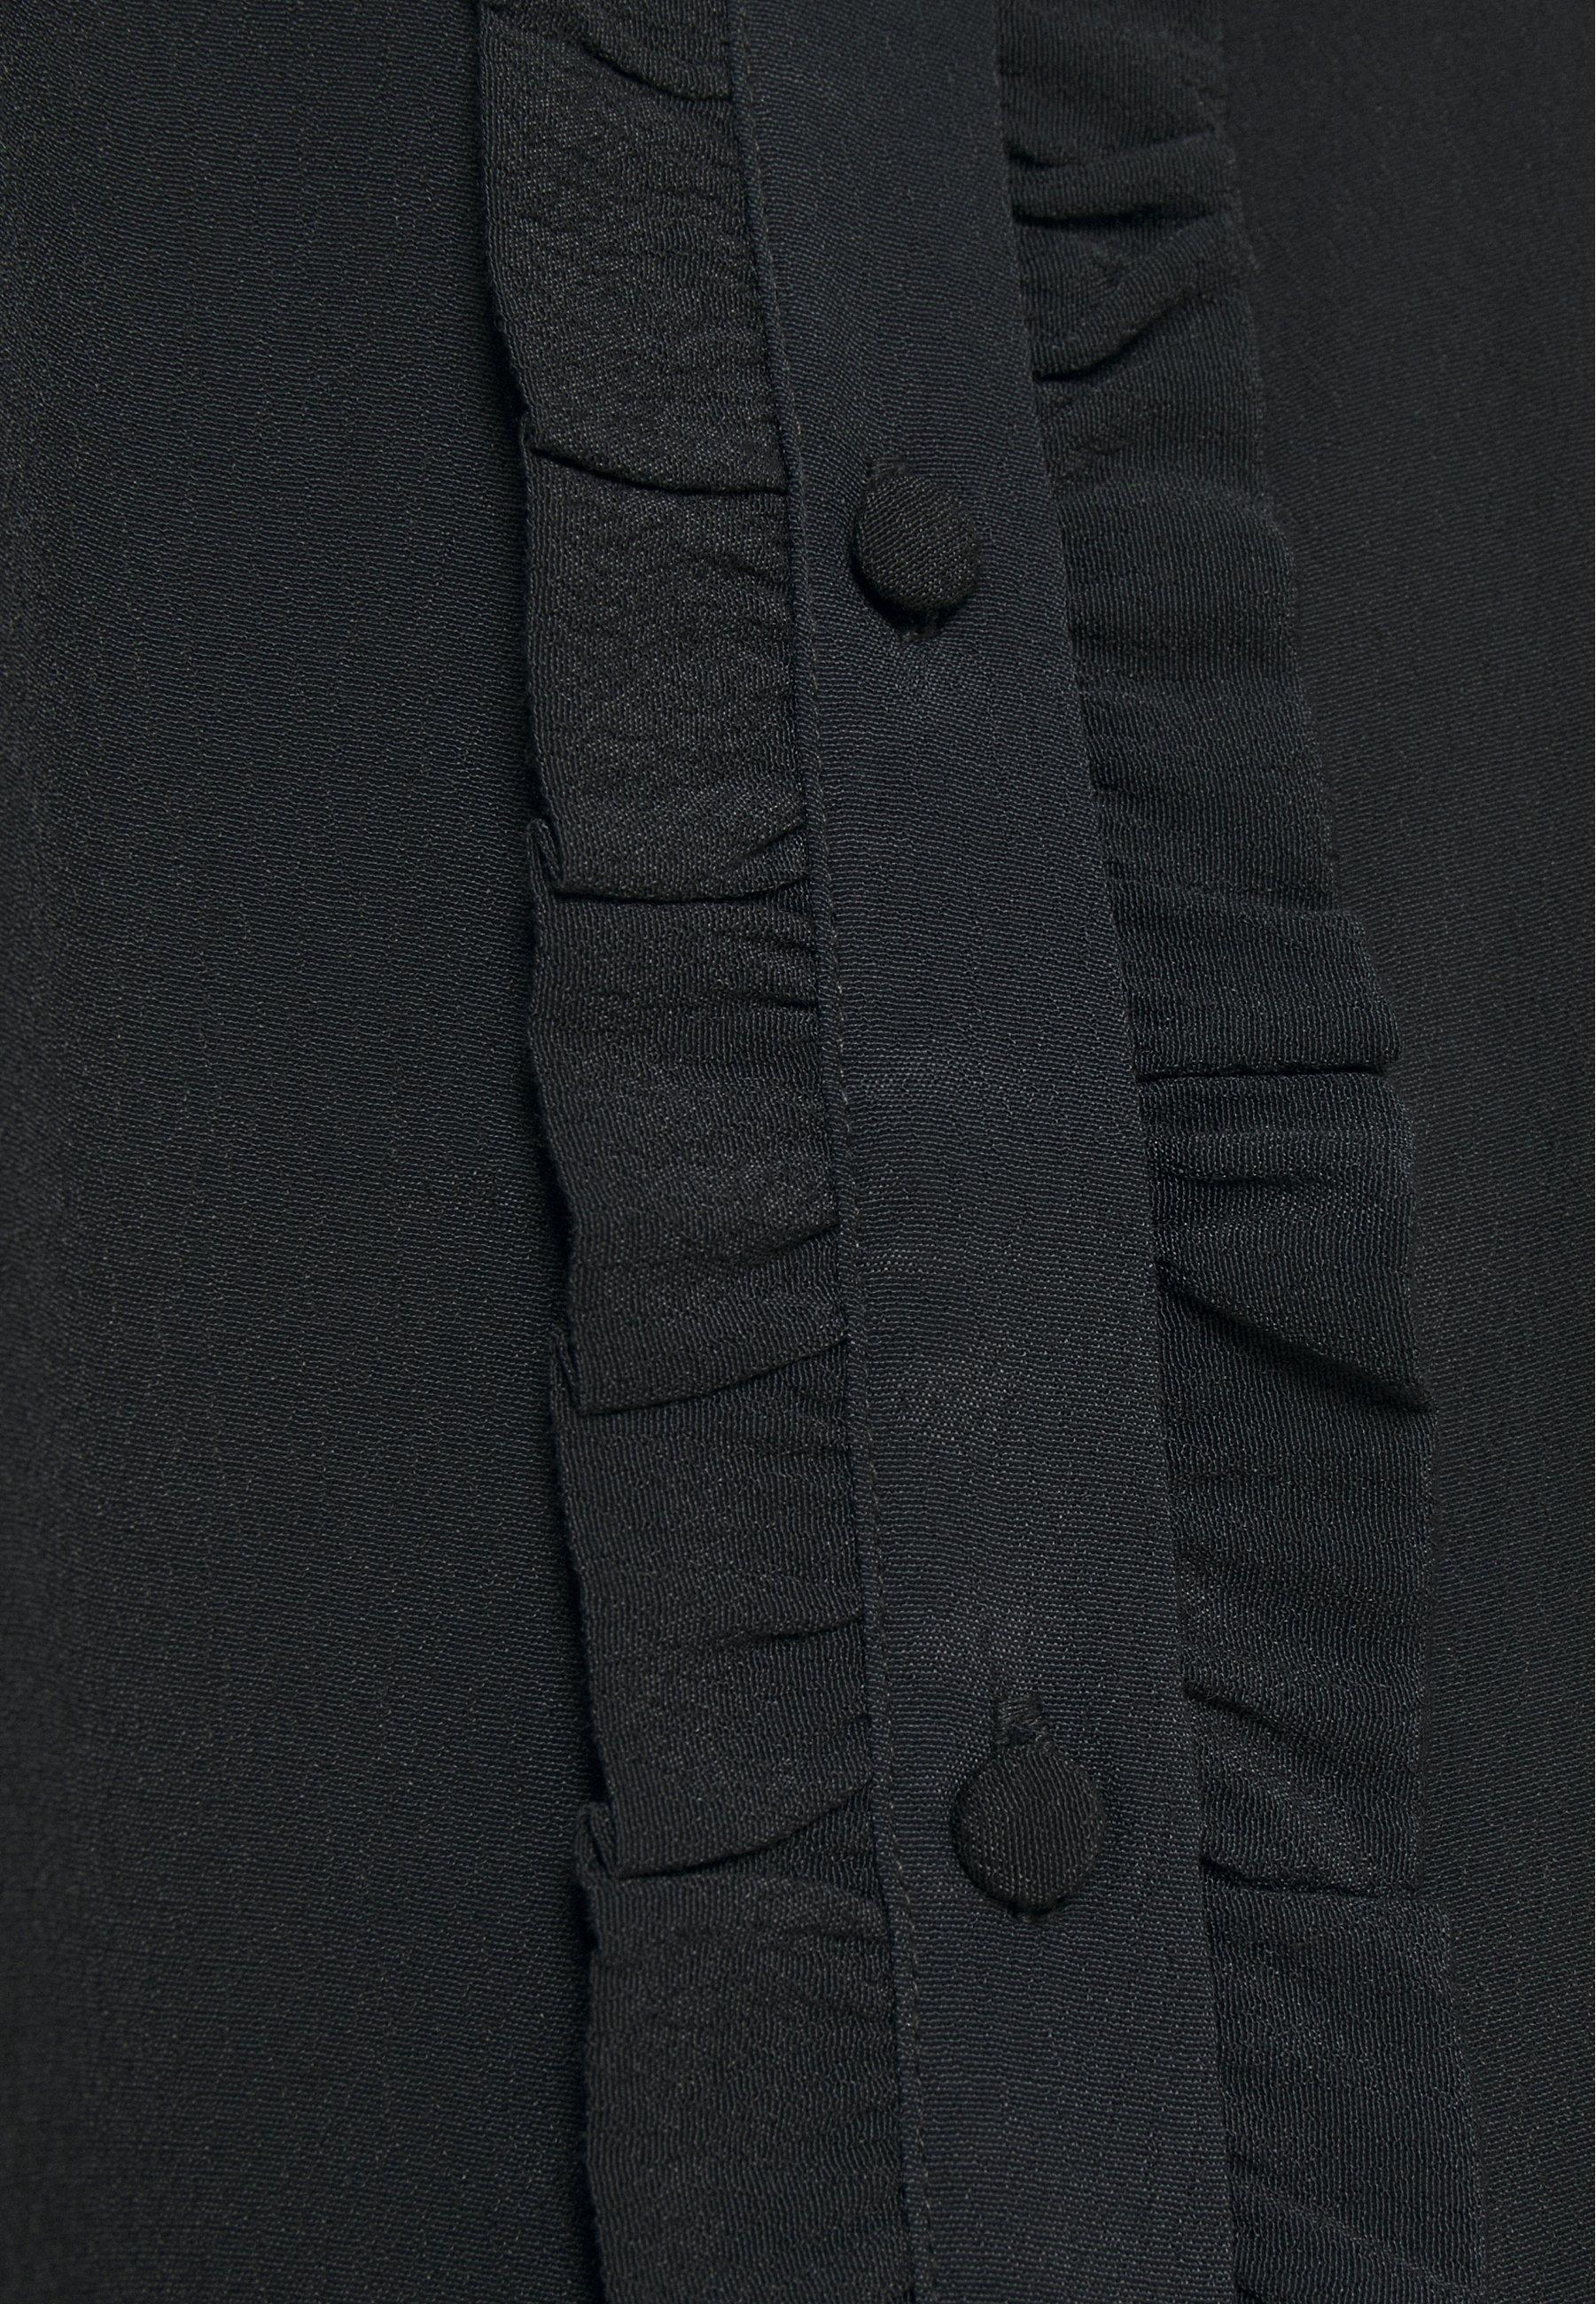 Bruuns Bazaar LILLI MINDY DRESS Blusenkleid black/schwarz